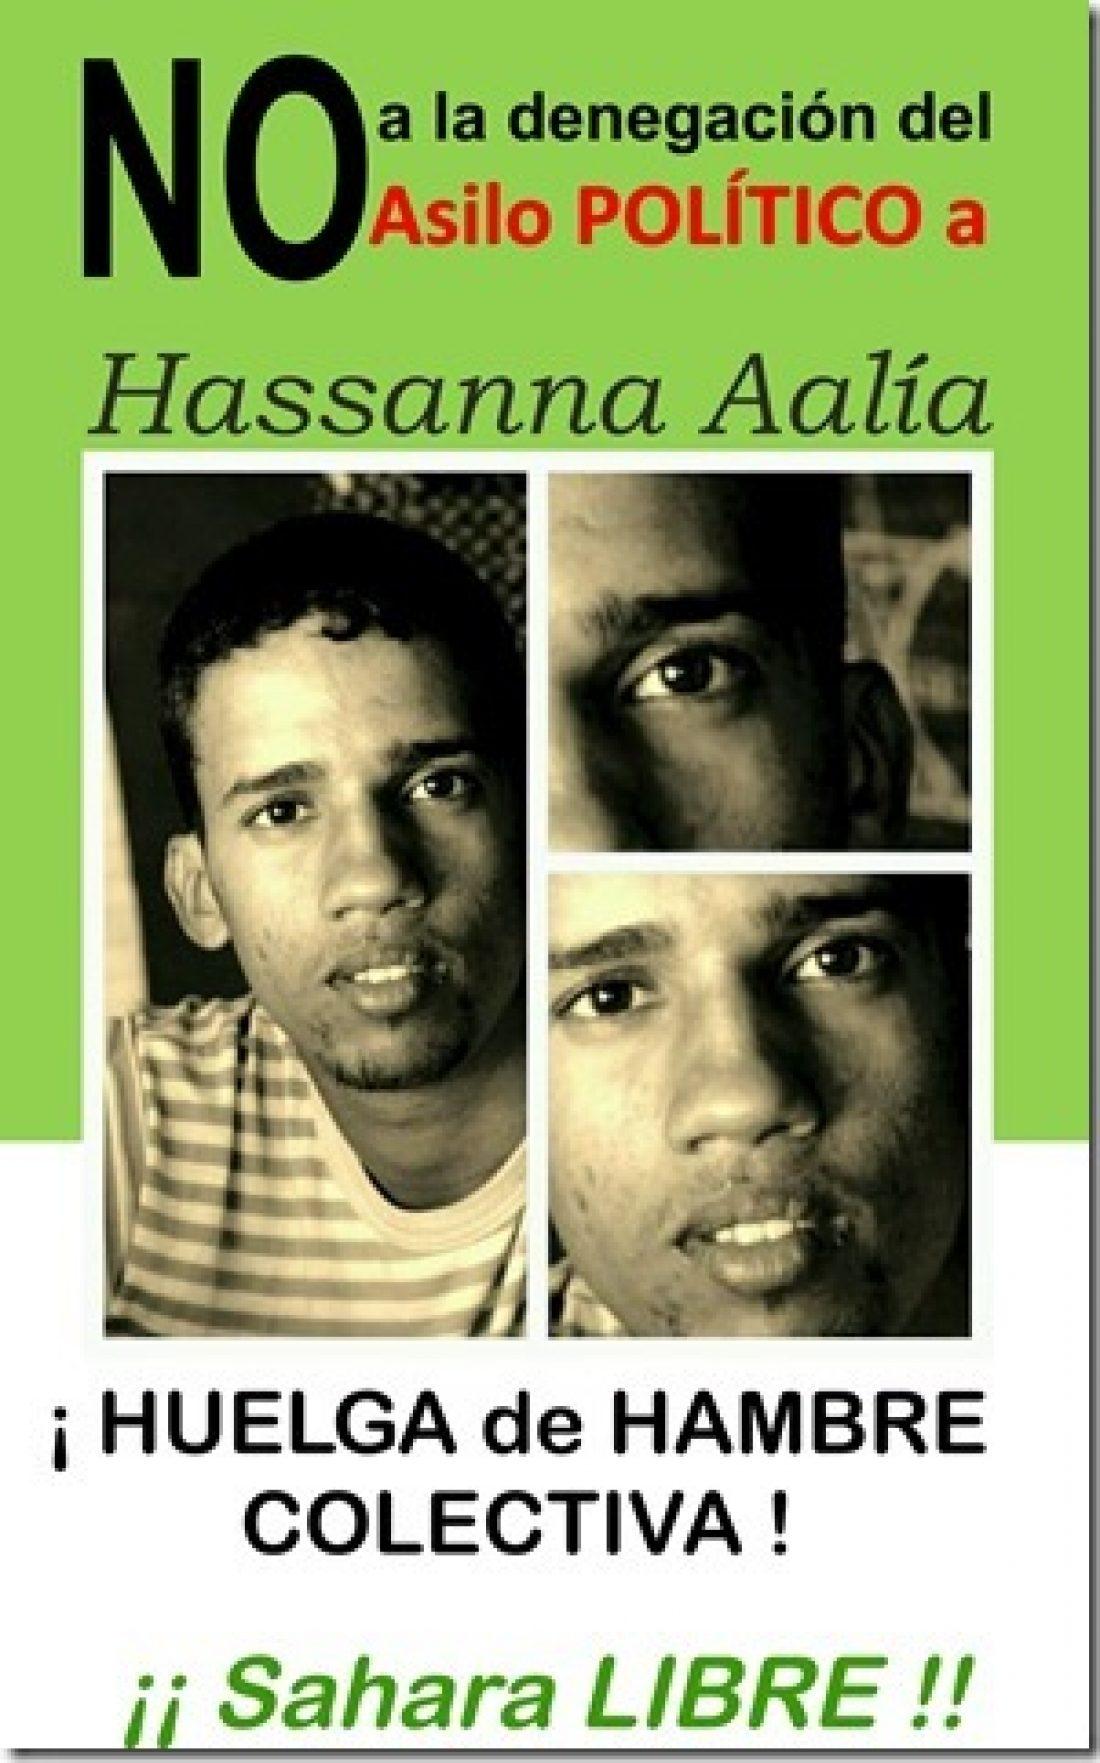 Hassanna no esta solo